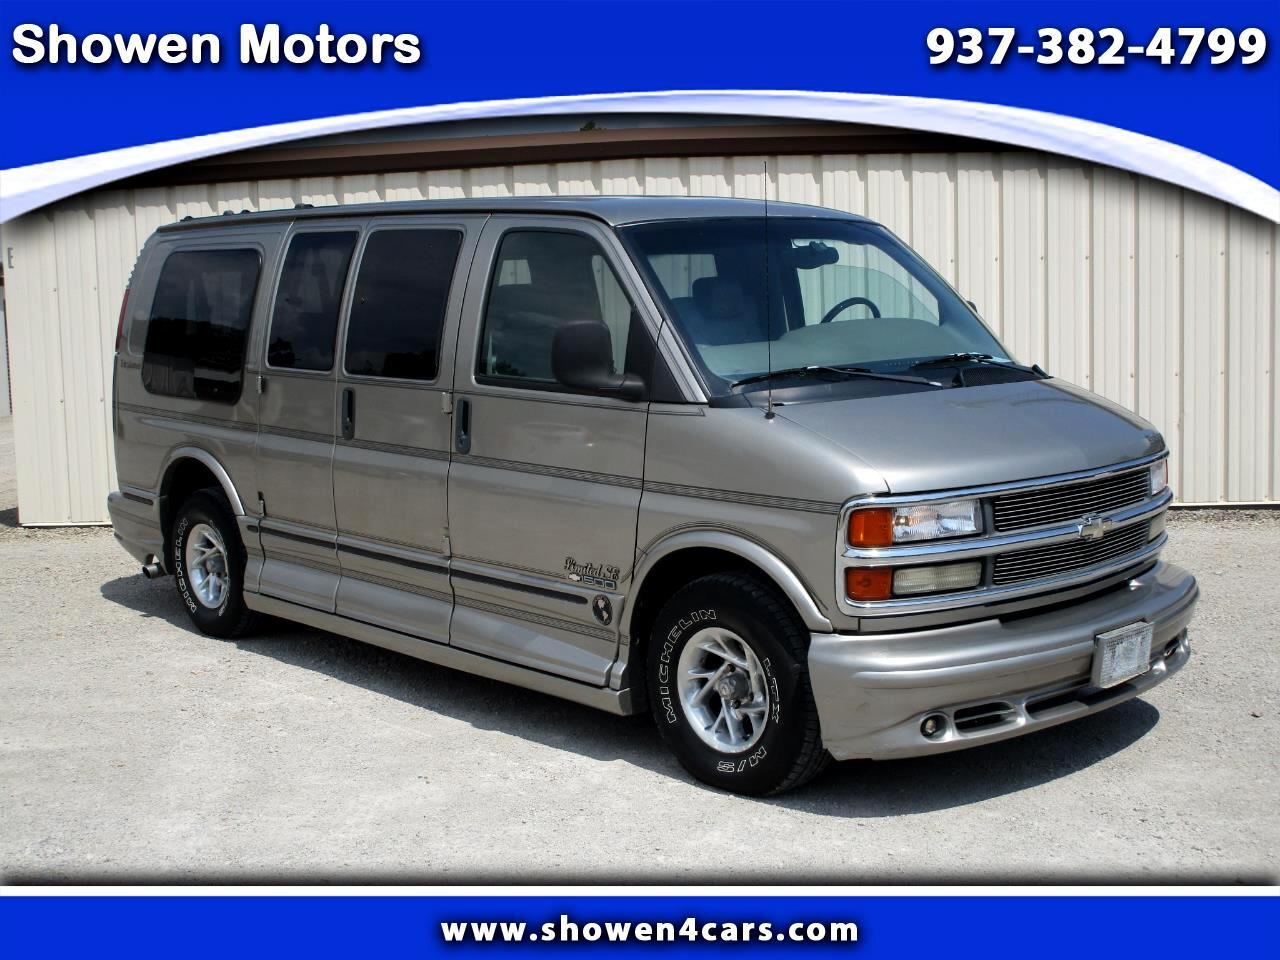 2001 Chevrolet Express Explorer Conversion